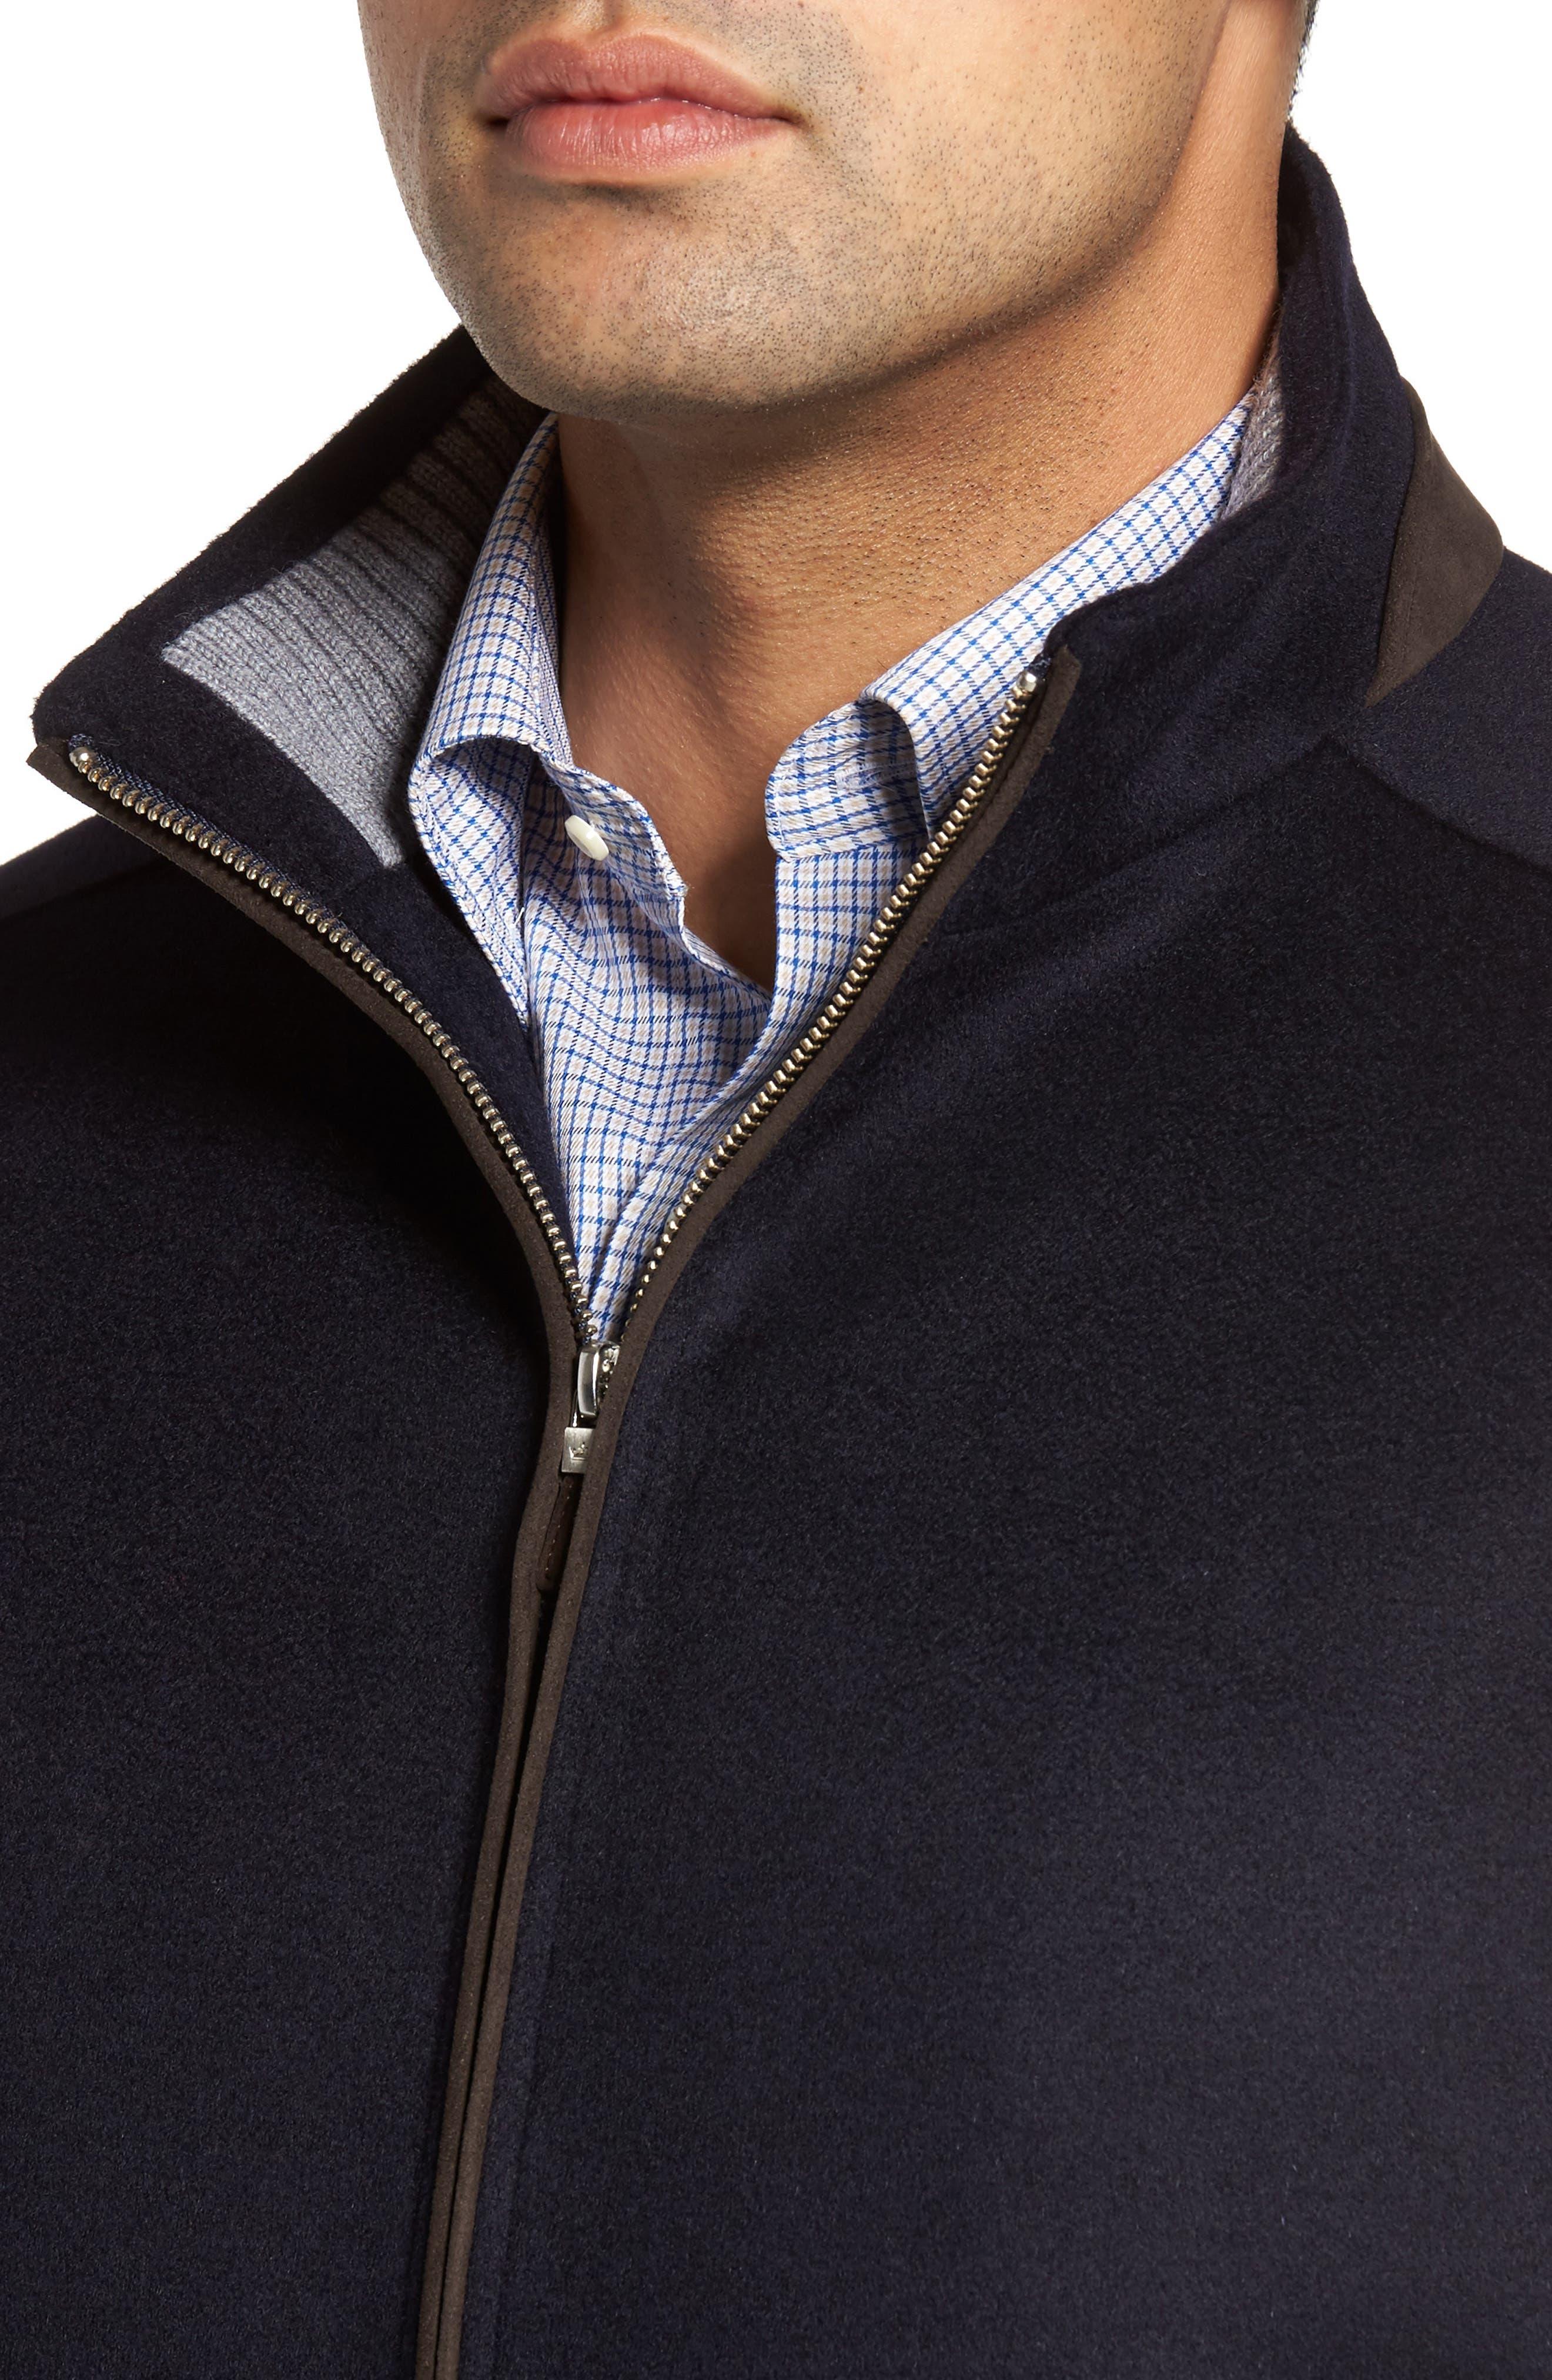 Westport Wool & Cashmere Jacket,                             Alternate thumbnail 12, color,